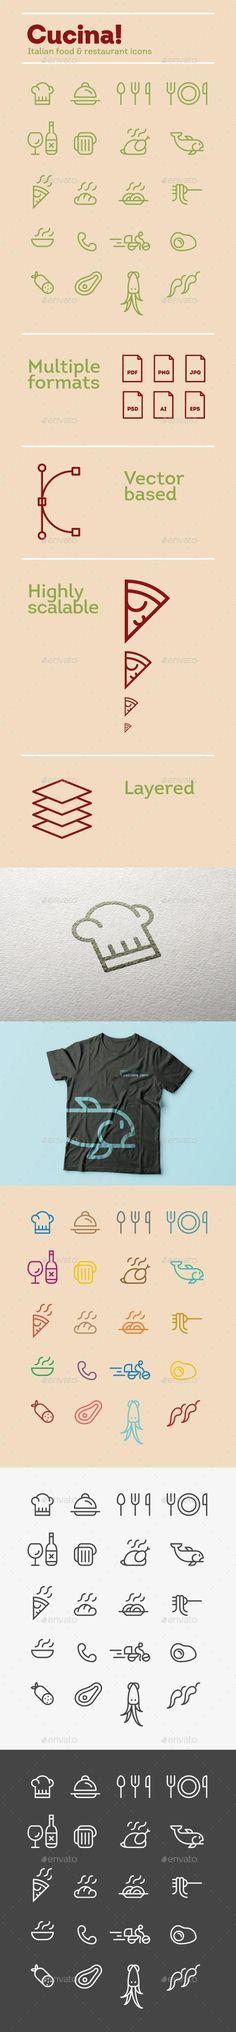 Cucina! / Italian food & restaurant icons